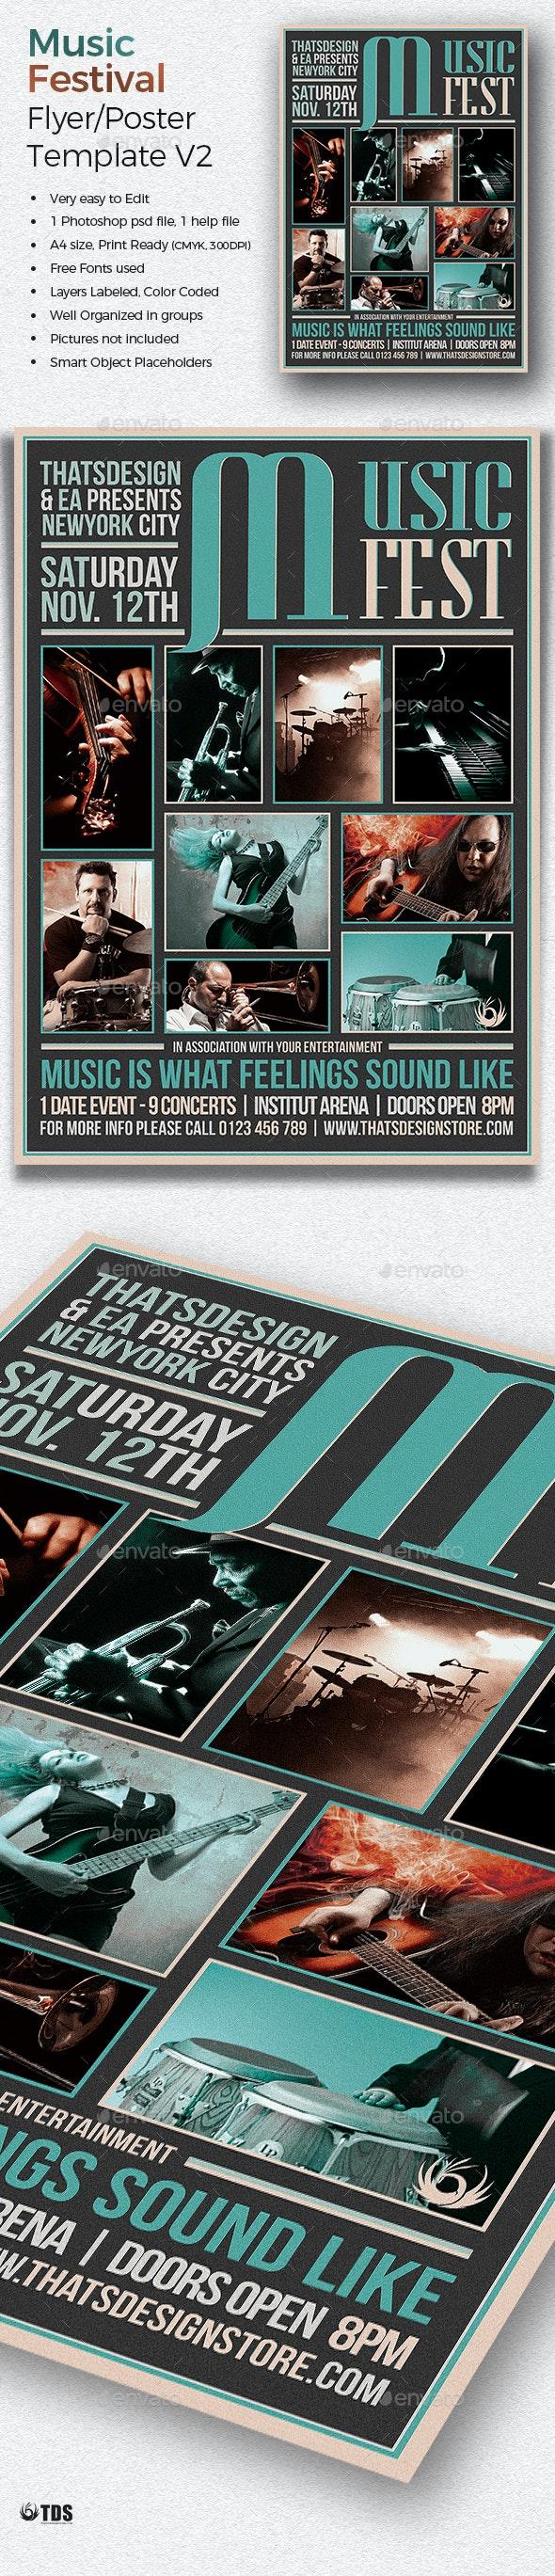 Music Festival Flyer Template V2 - Concerts Events